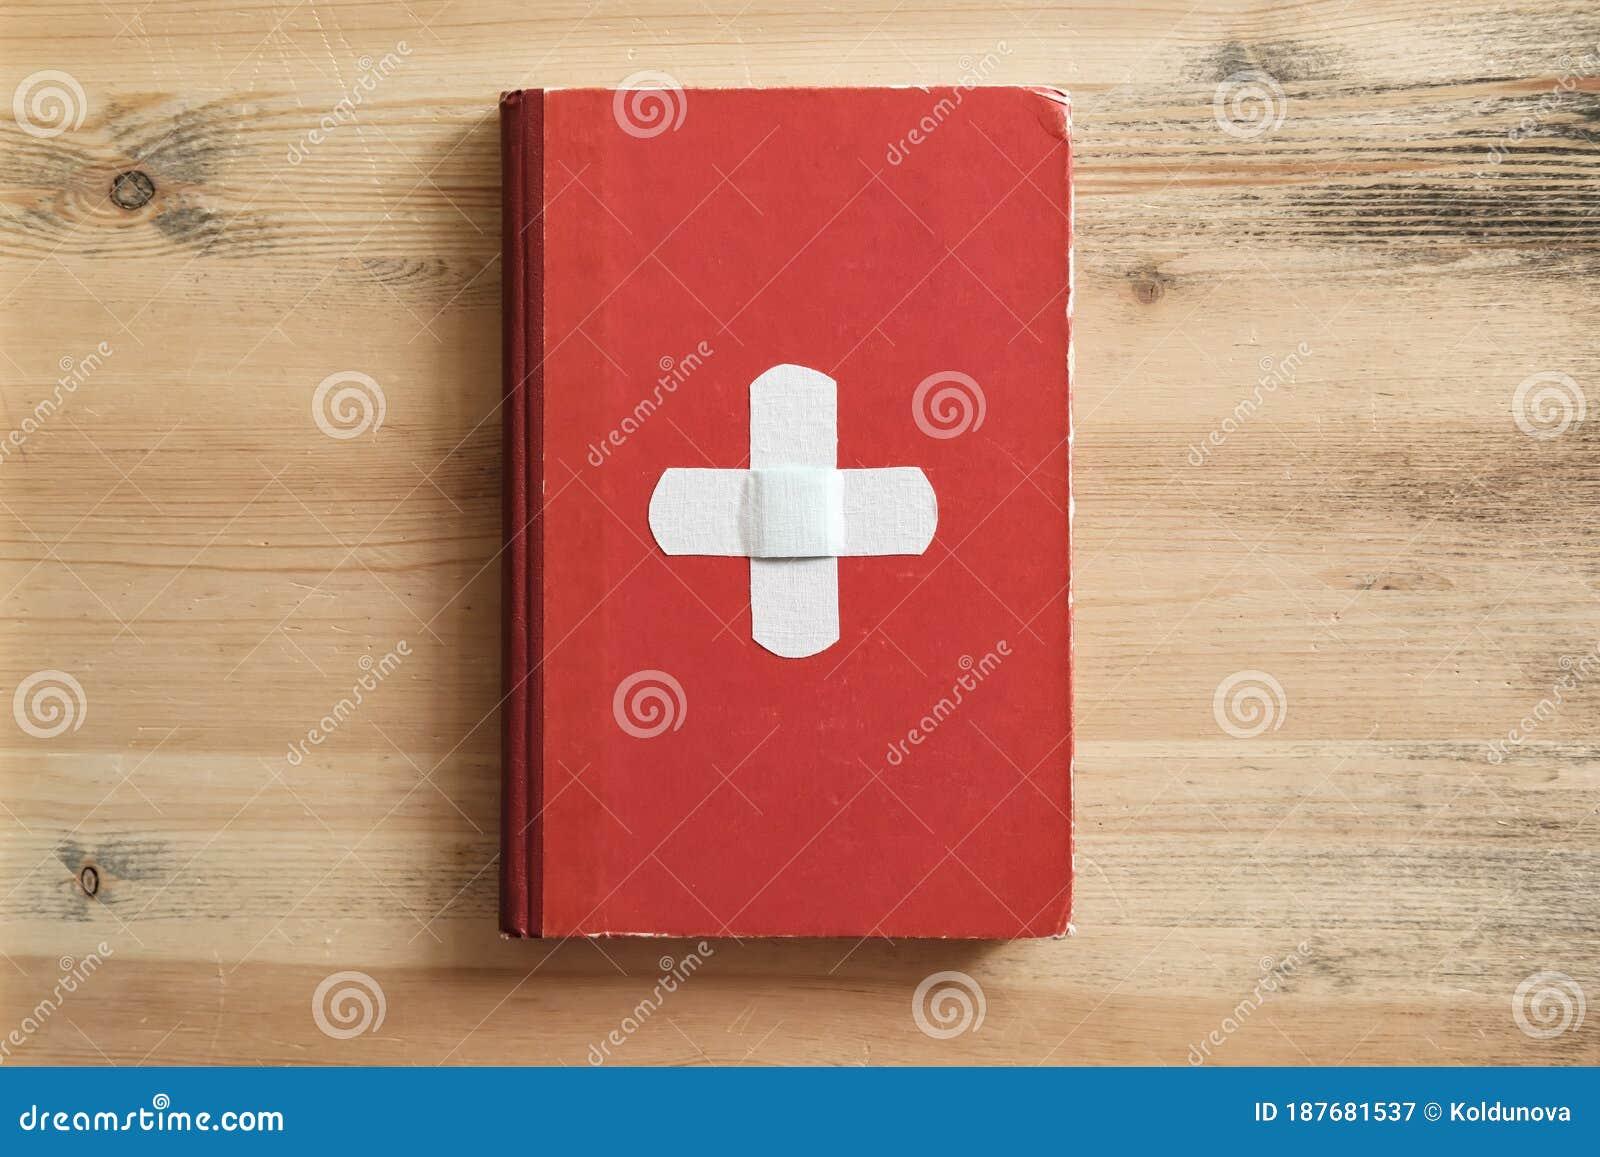 Redbook like IMS Primer